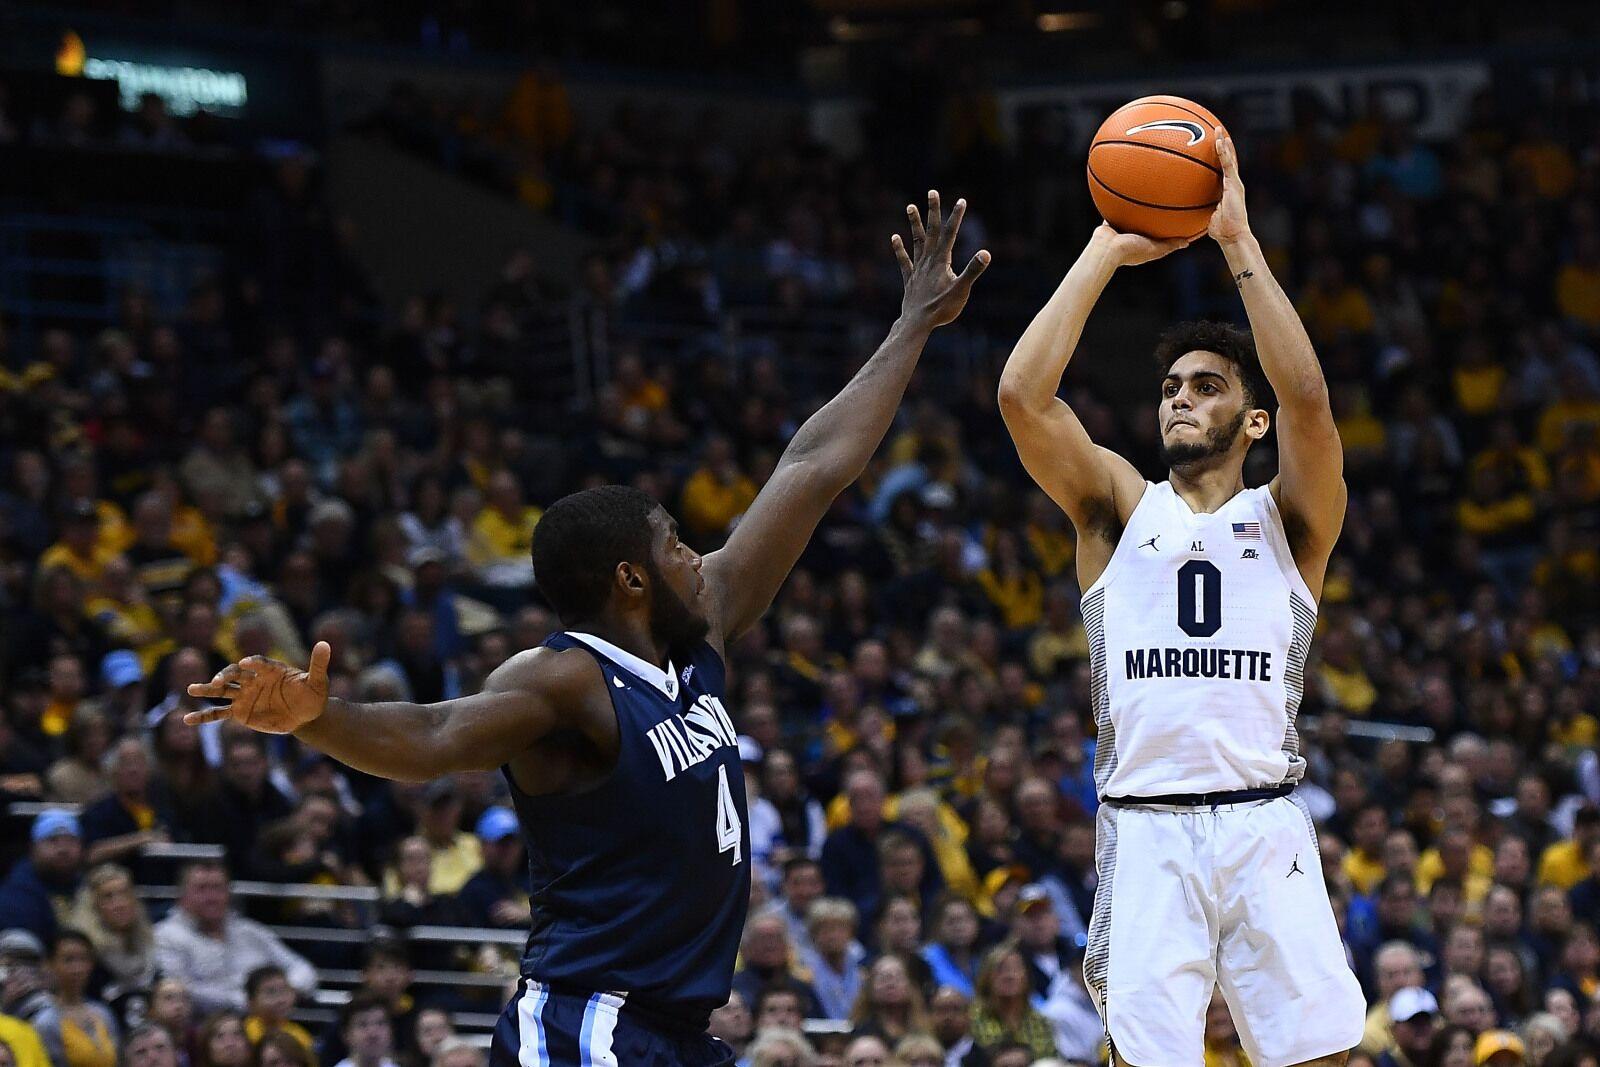 Wisconsin Basketball seeking revenge against Marquette